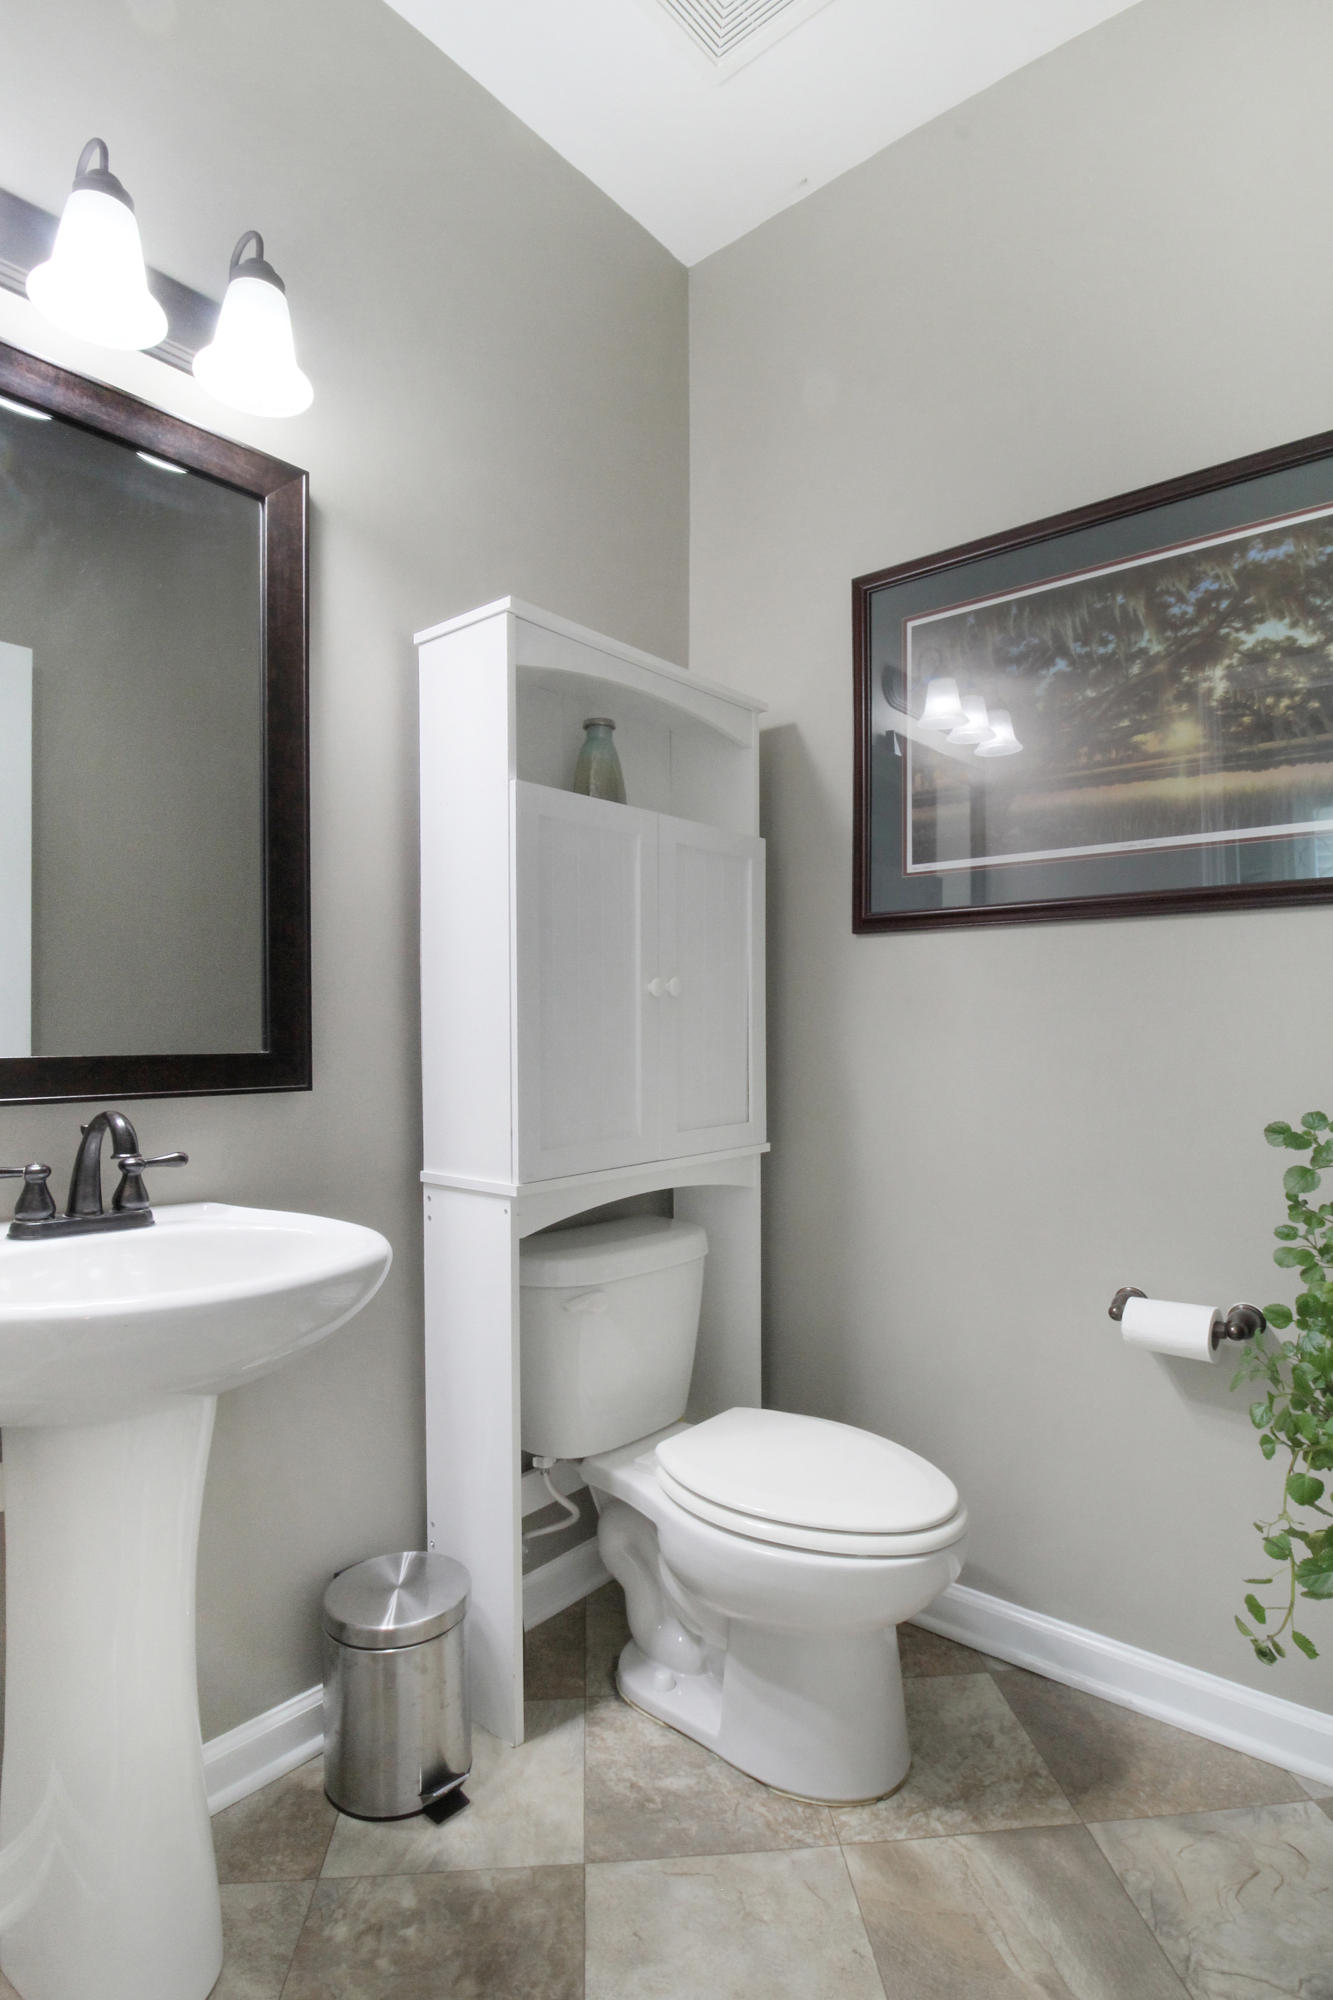 Woodlands Homes For Sale - 2161 Ashley Cooper, Charleston, SC - 8